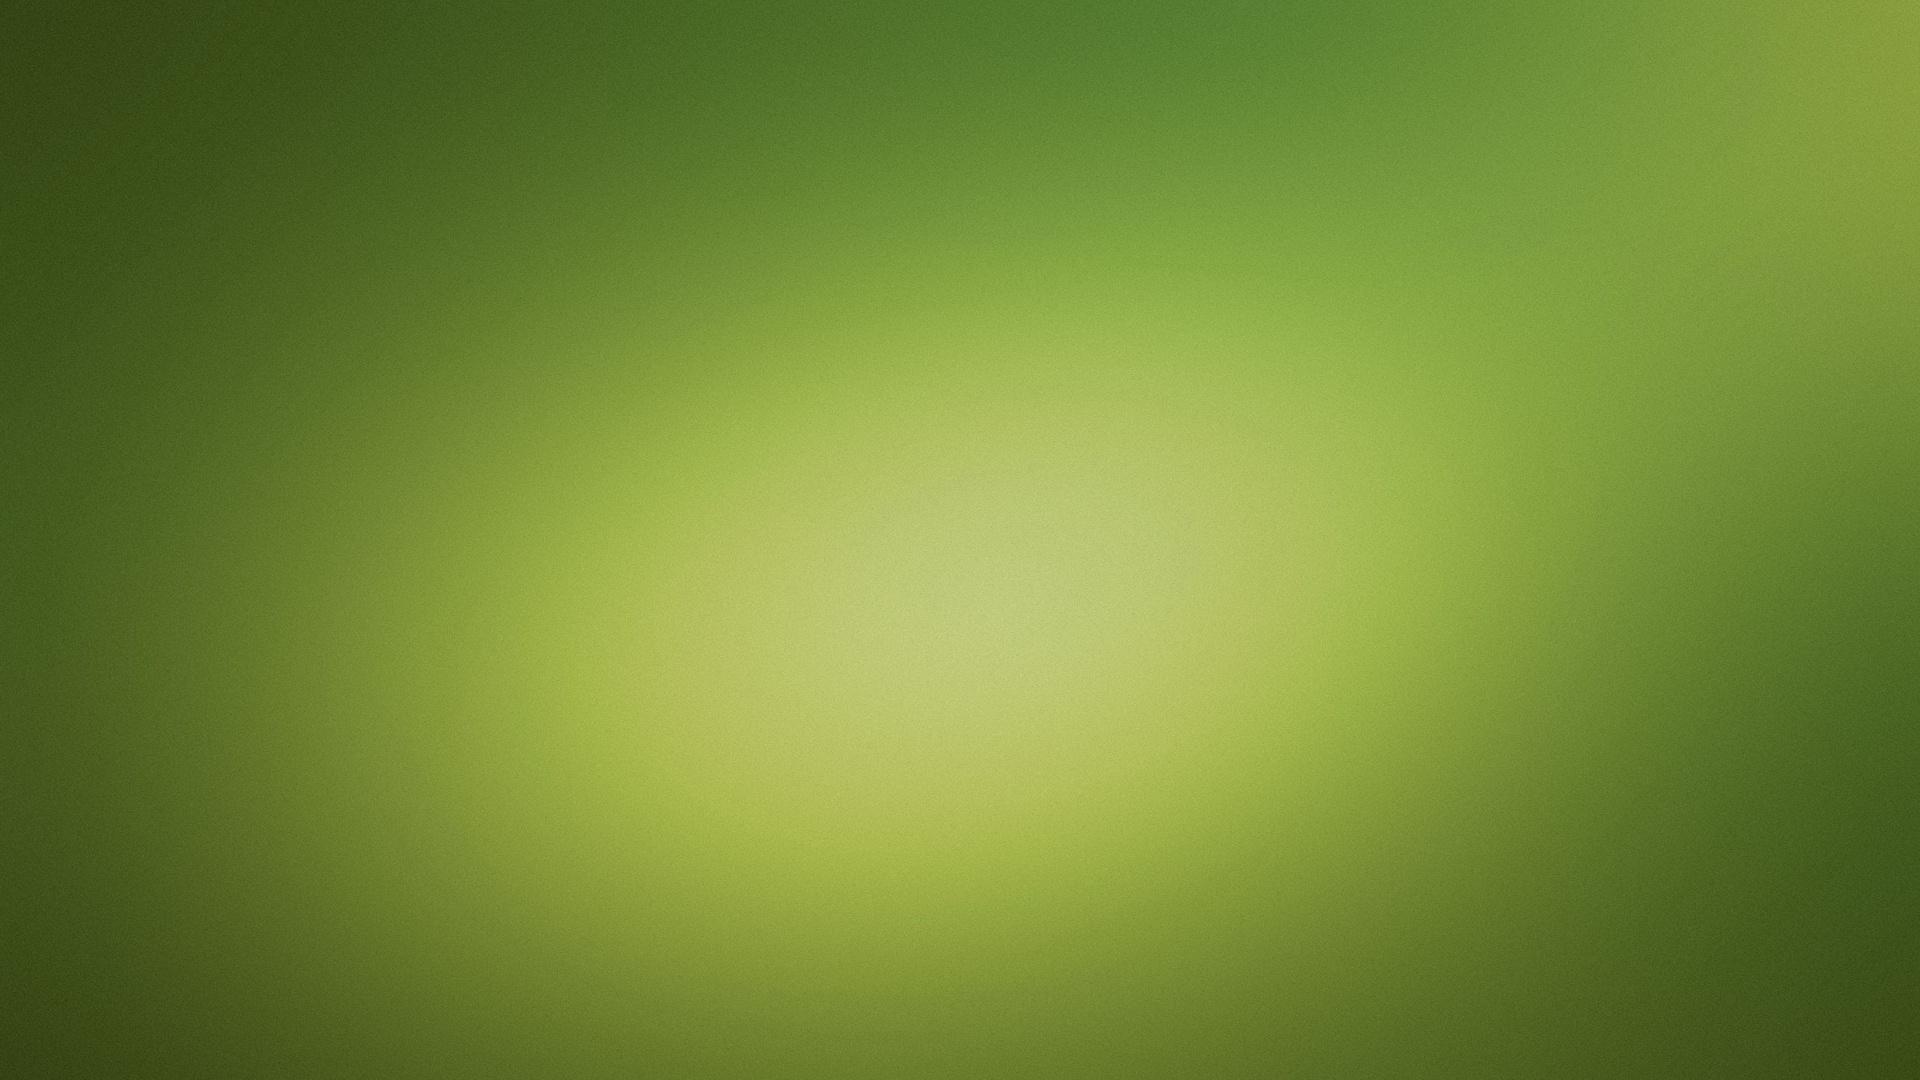 wallpaper-212937-8487541-8-6160278